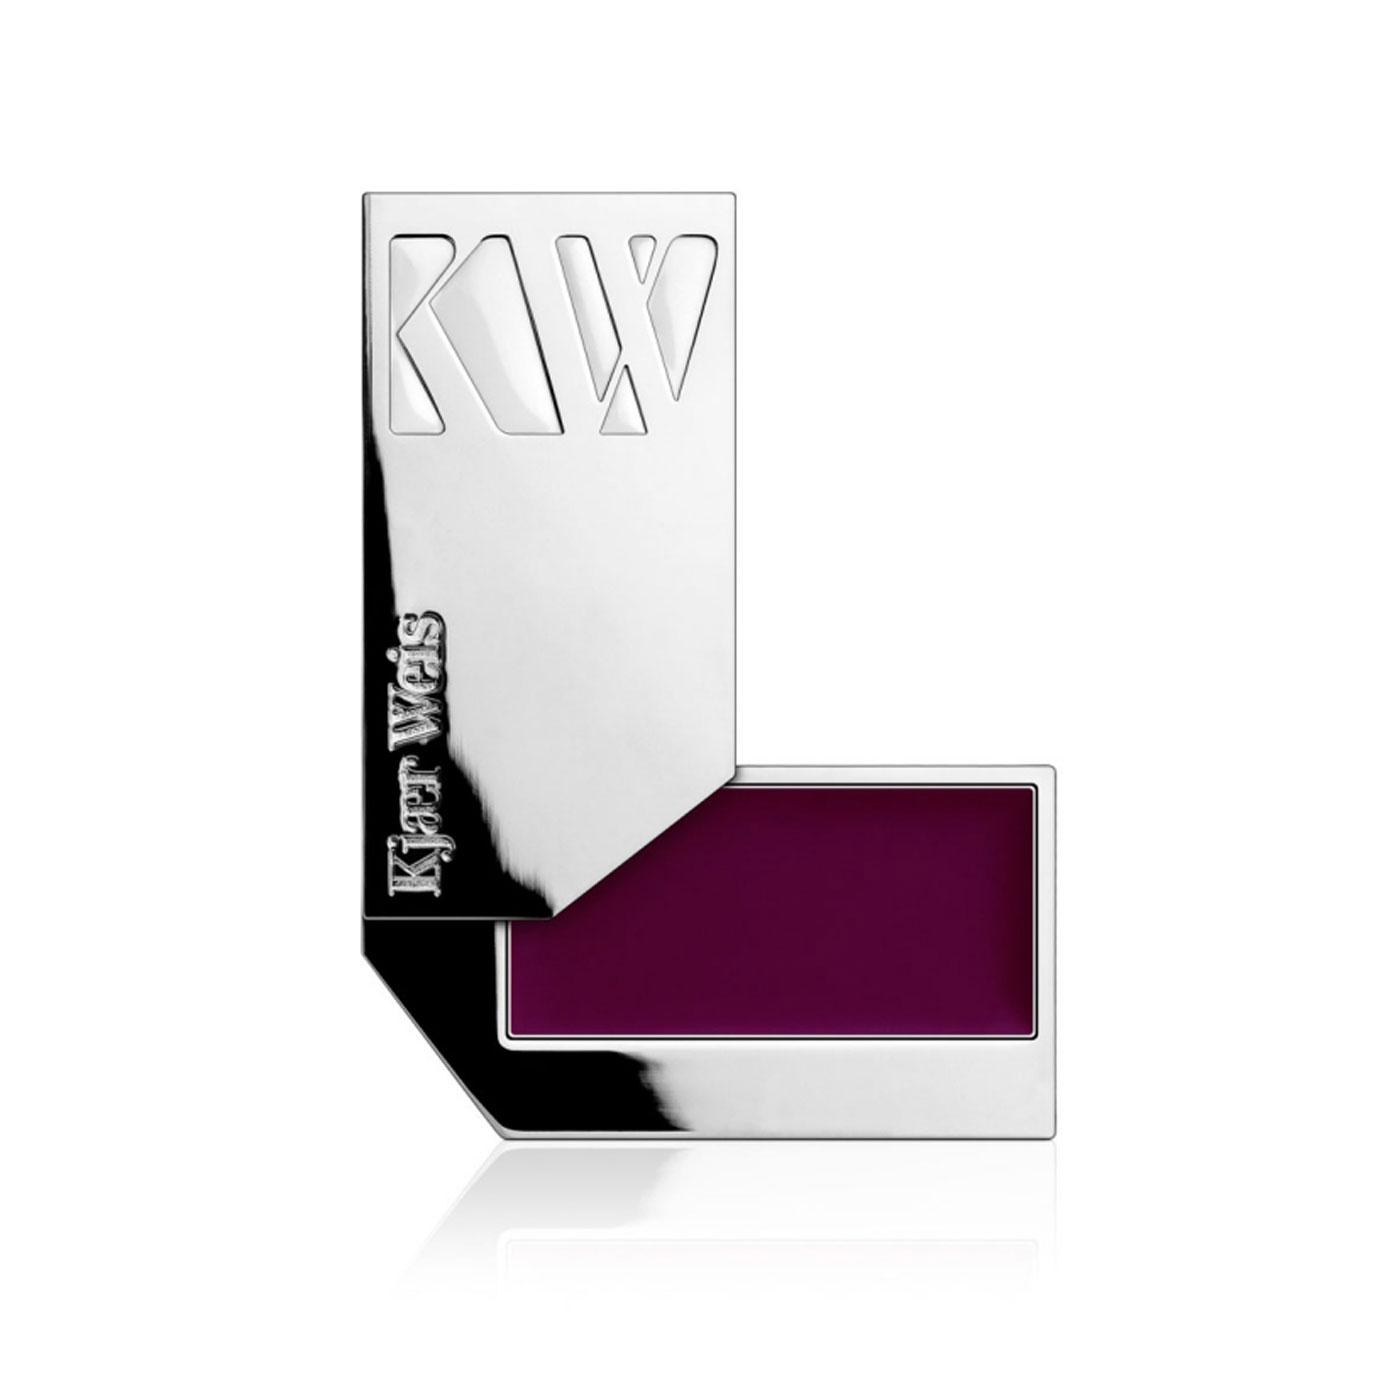 KJAER WEIS • Lip Tint • 49 USD